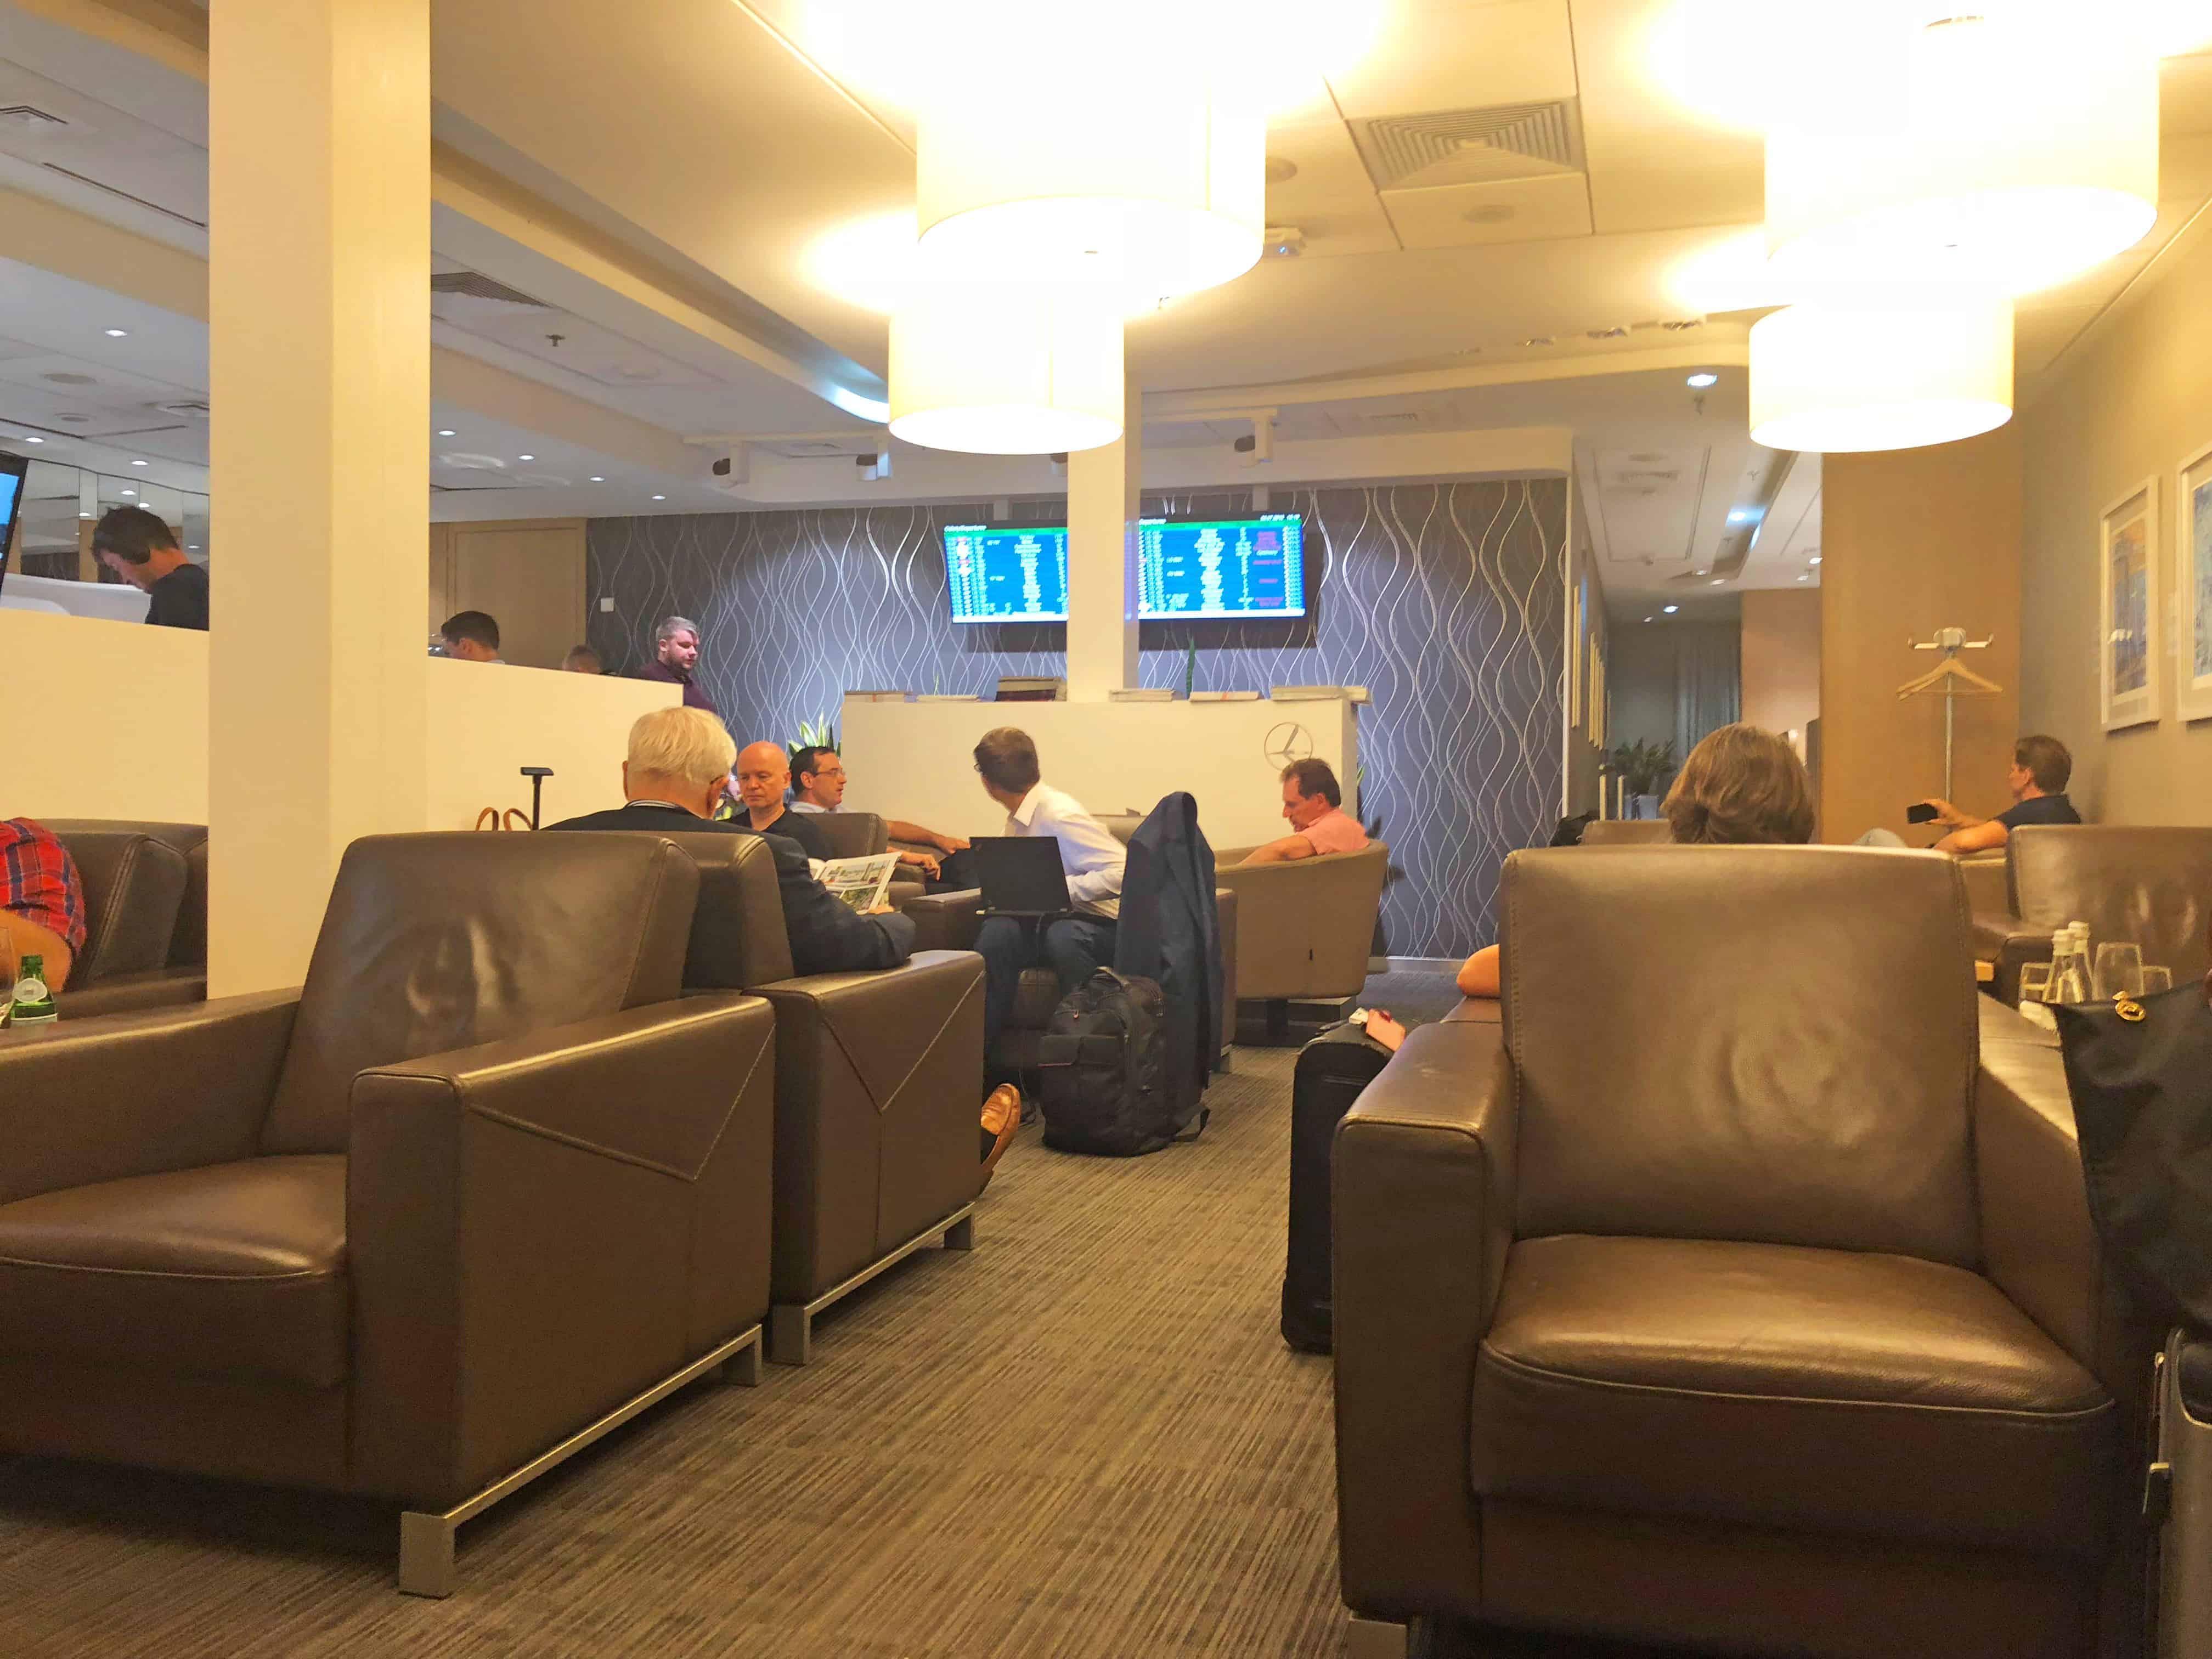 LOT Bewertung LOT Lounge Sitzbereich